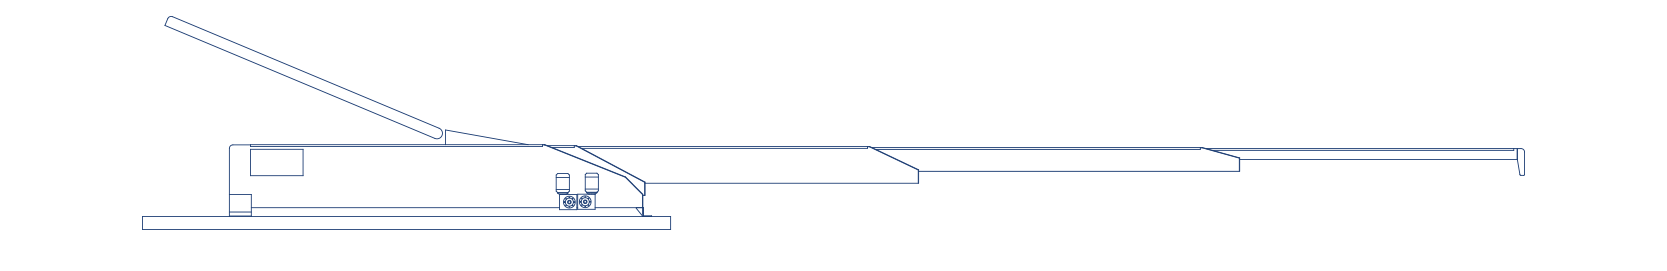 ski jump options for MTC conveyor